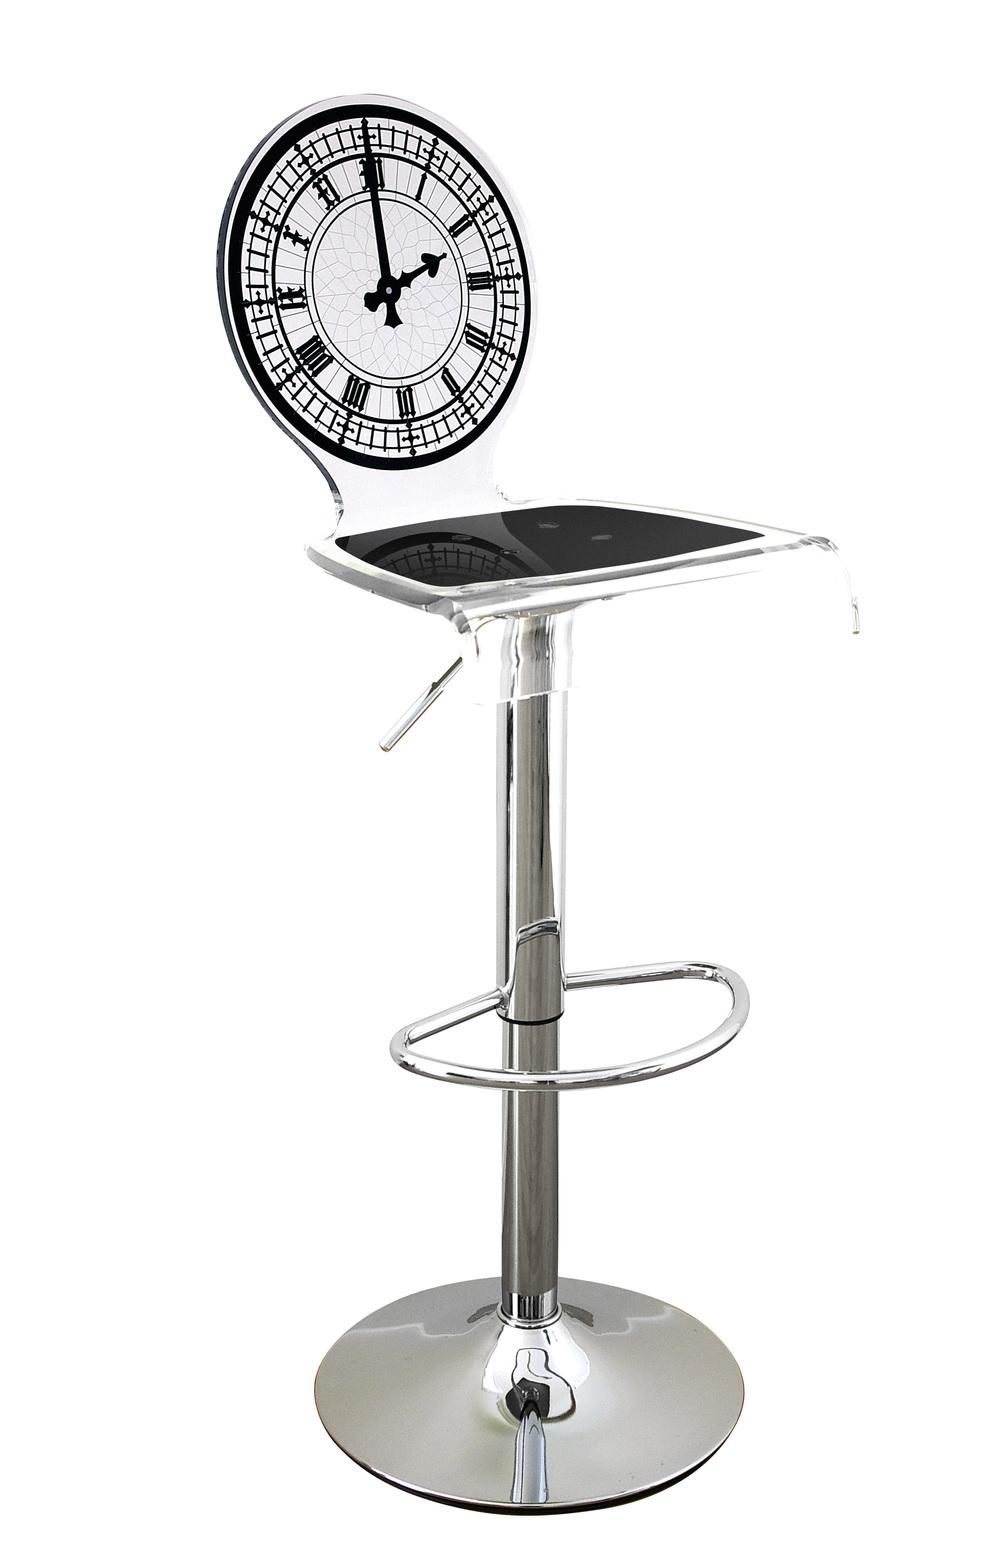 TAB PD LetsRock horloge.jpg